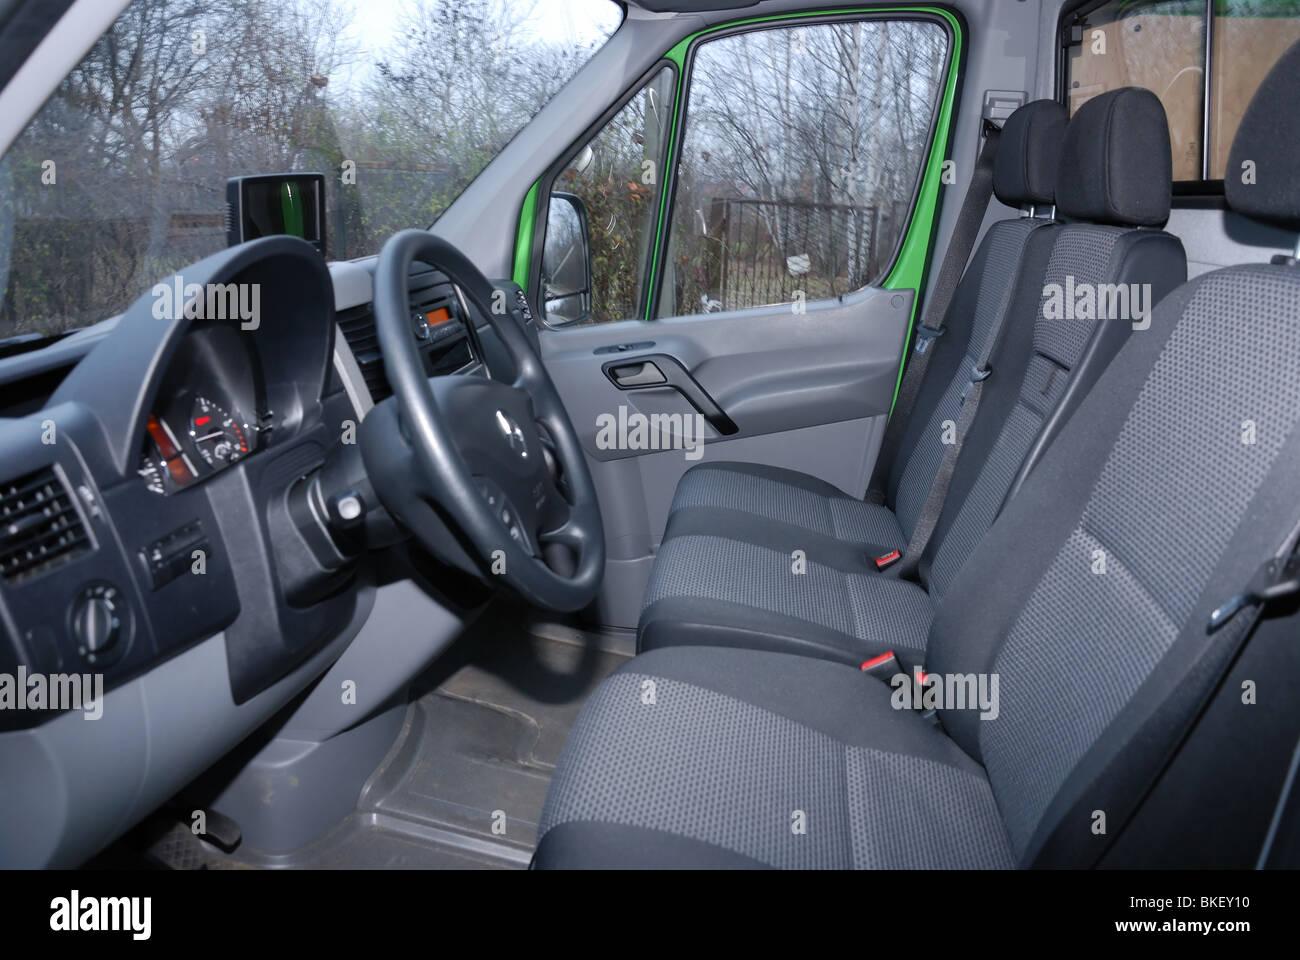 Mercedes benz sprinter 260 cdi van green l3h2 german mcv van interior cabin dashboard steering wheel